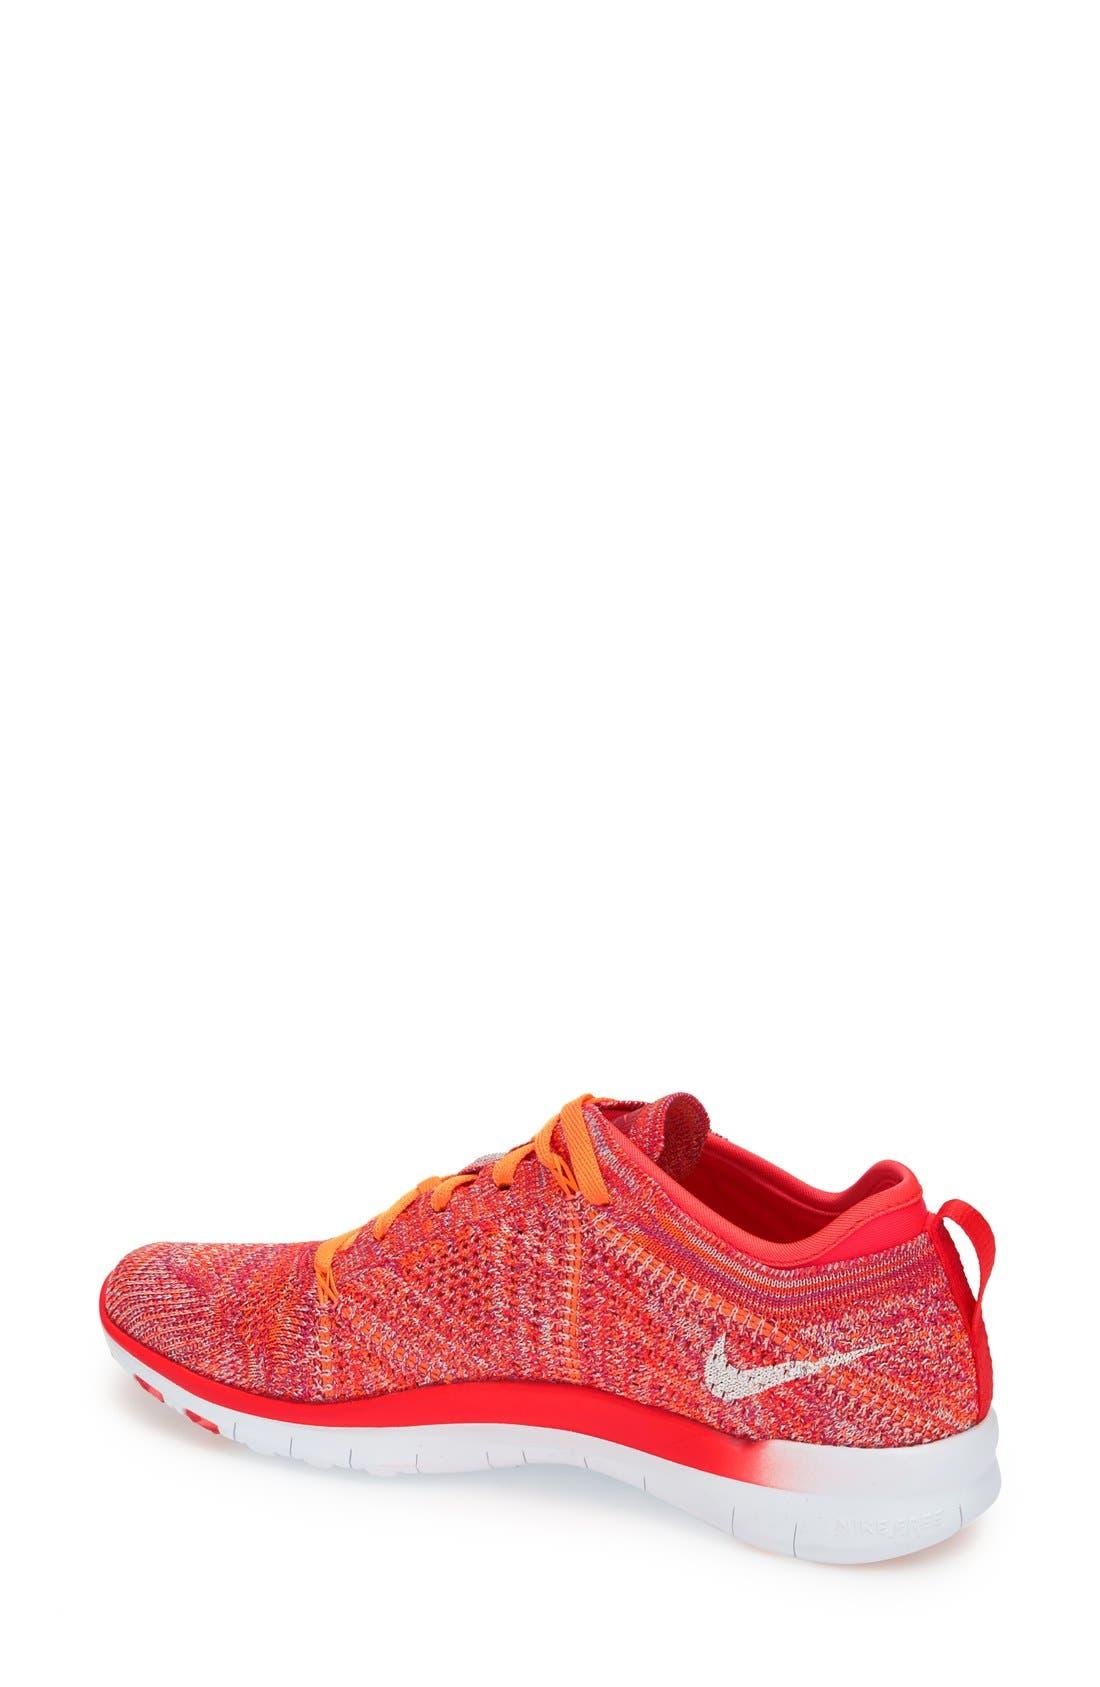 ,                             'Free Flyknit 5.0 TR' Training Shoe,                             Alternate thumbnail 49, color,                             600